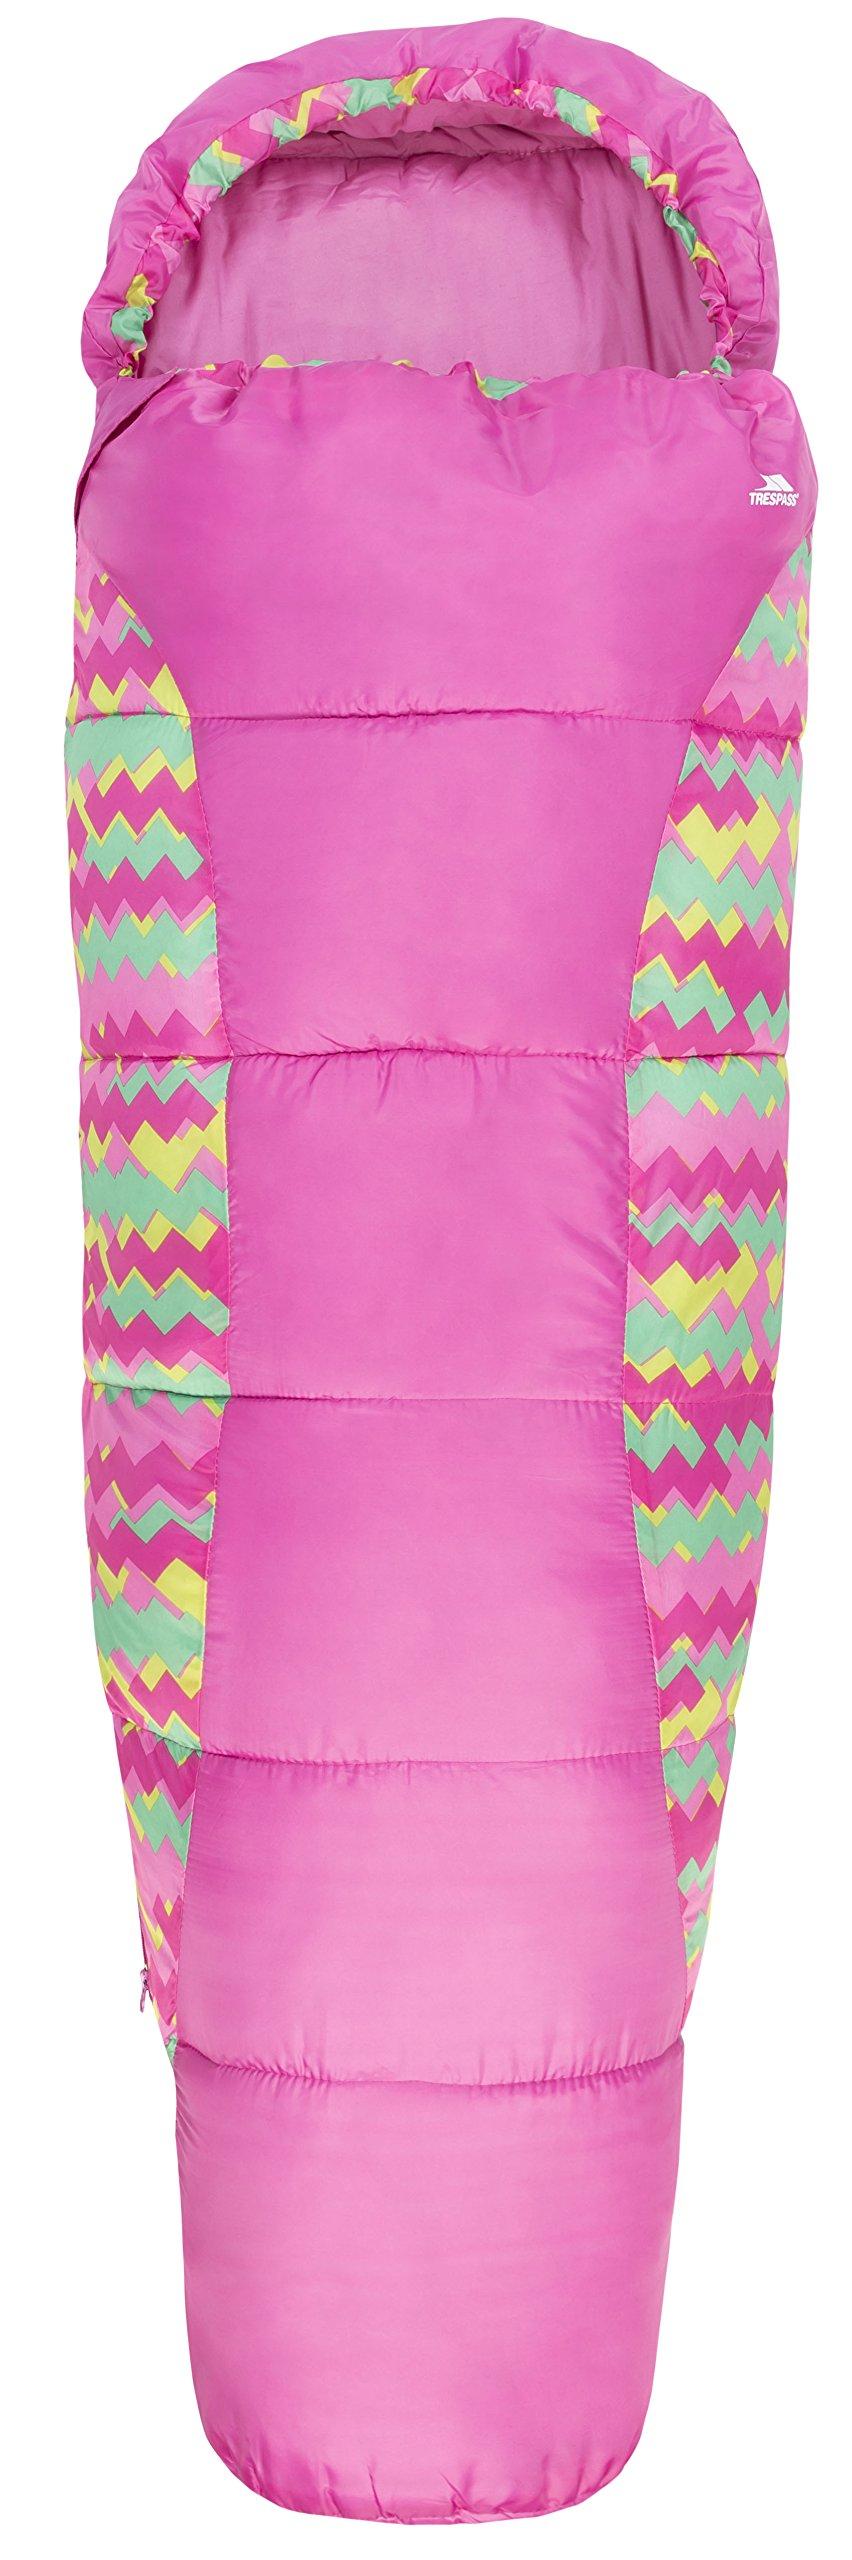 Trespass Unisex Child BUNKA 3 Season Sleeping Bag with Hollow Fibre Filling 2